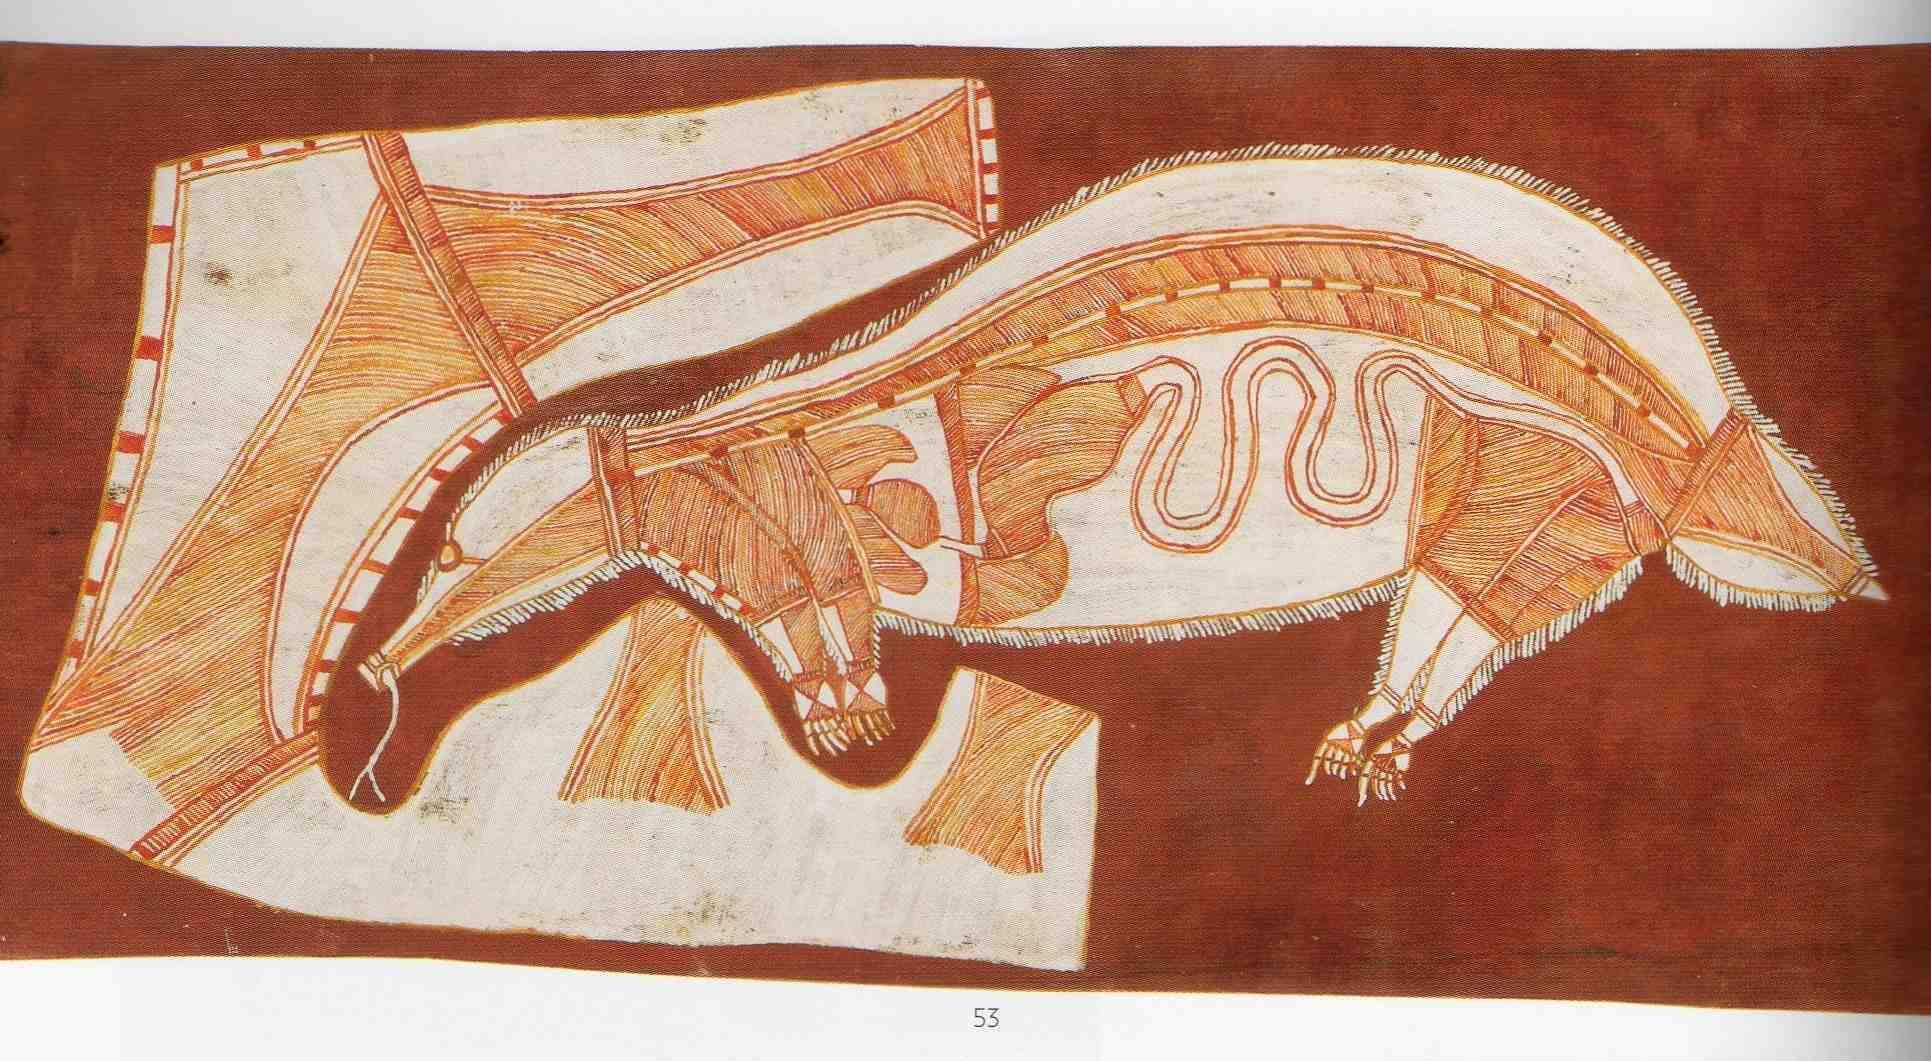 Nabardayal echidna